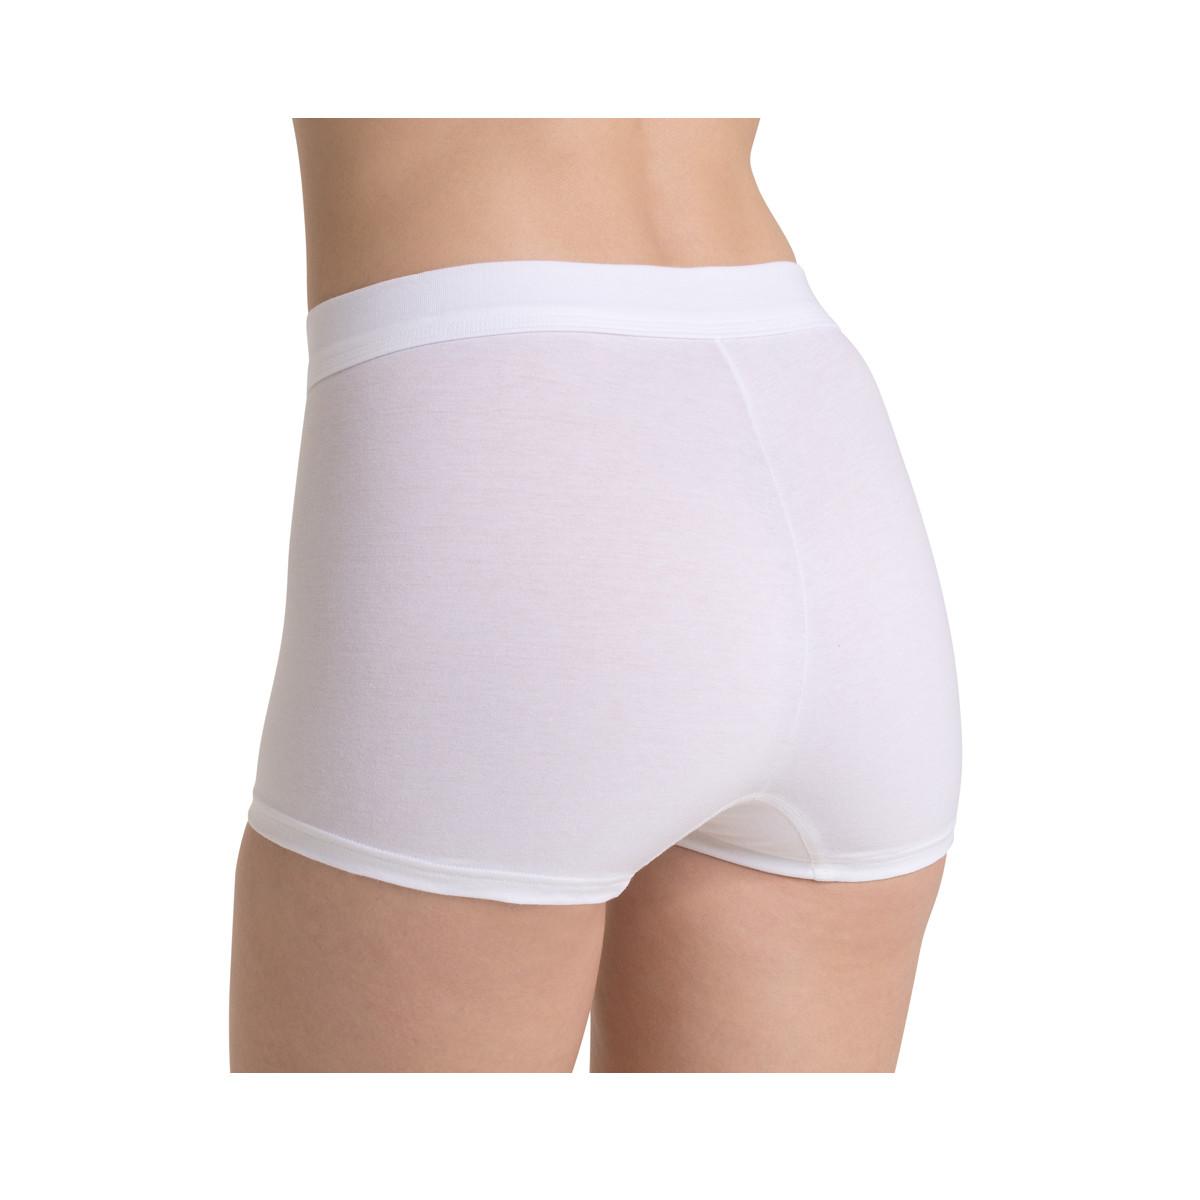 Sloggi Double Comfort Shorts trusse